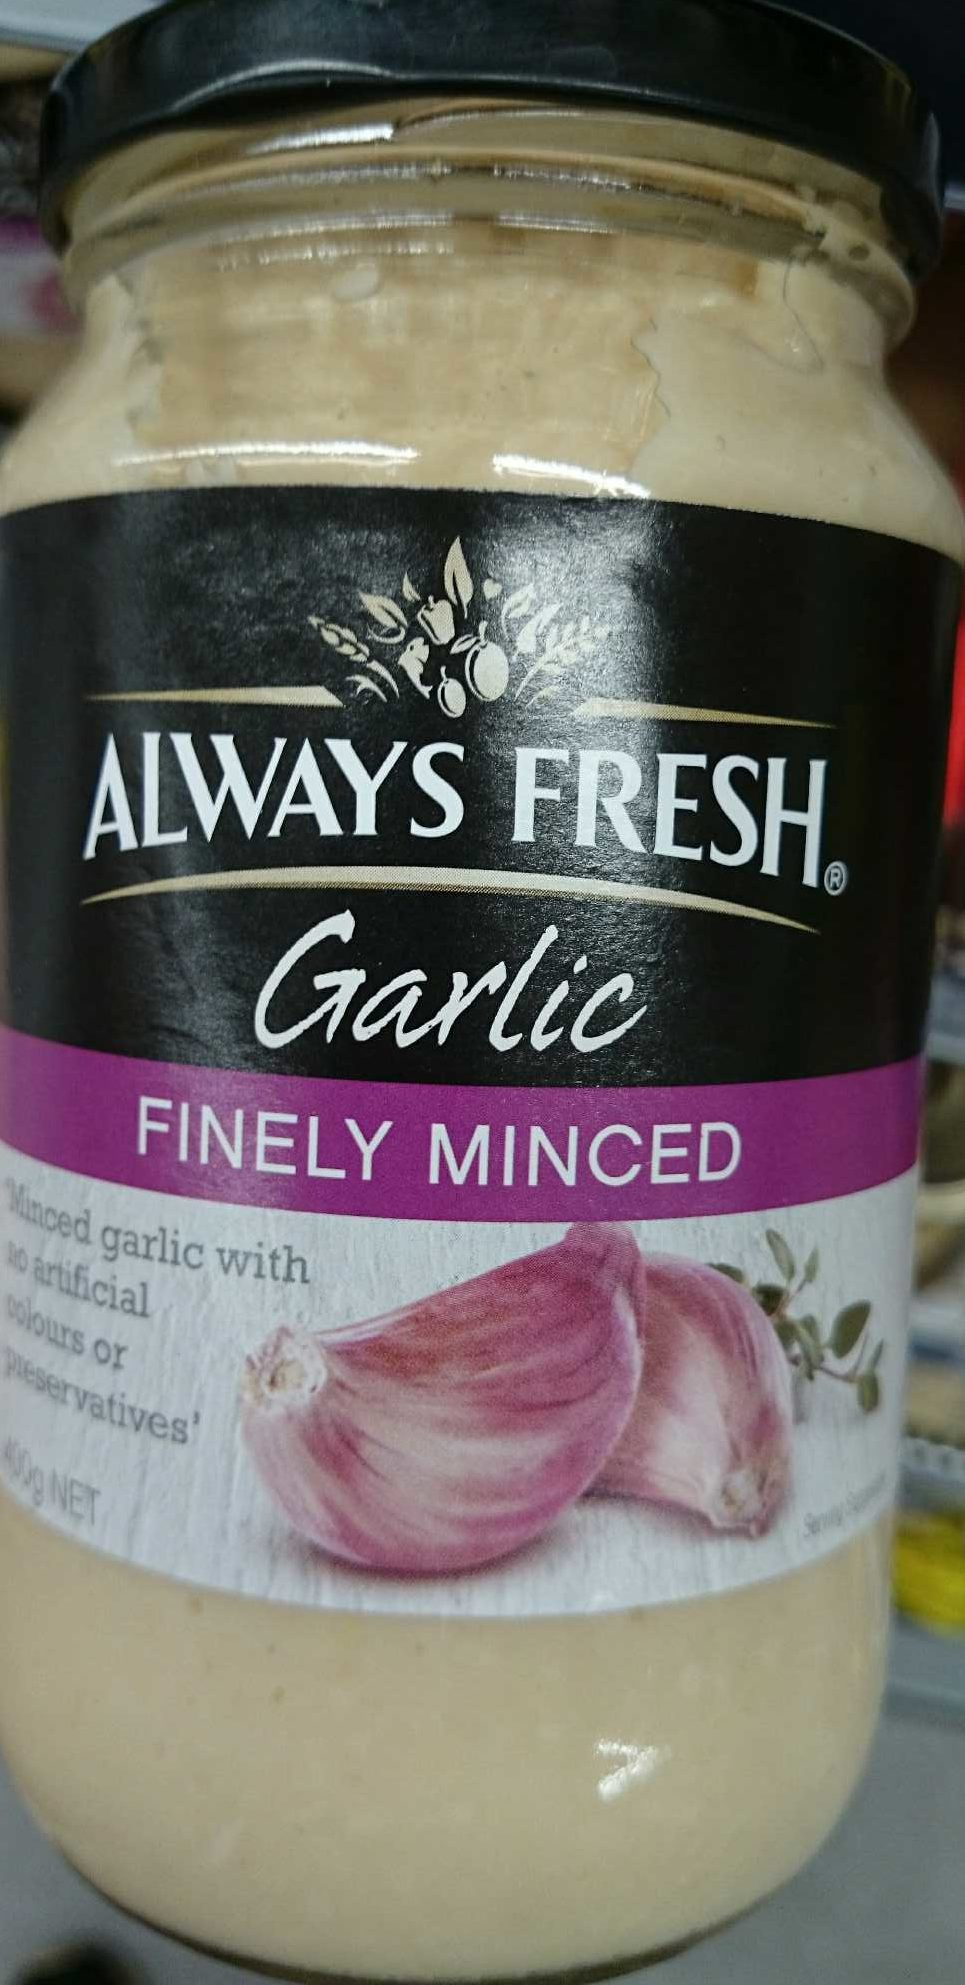 Garlic Finely Minced - Product - en